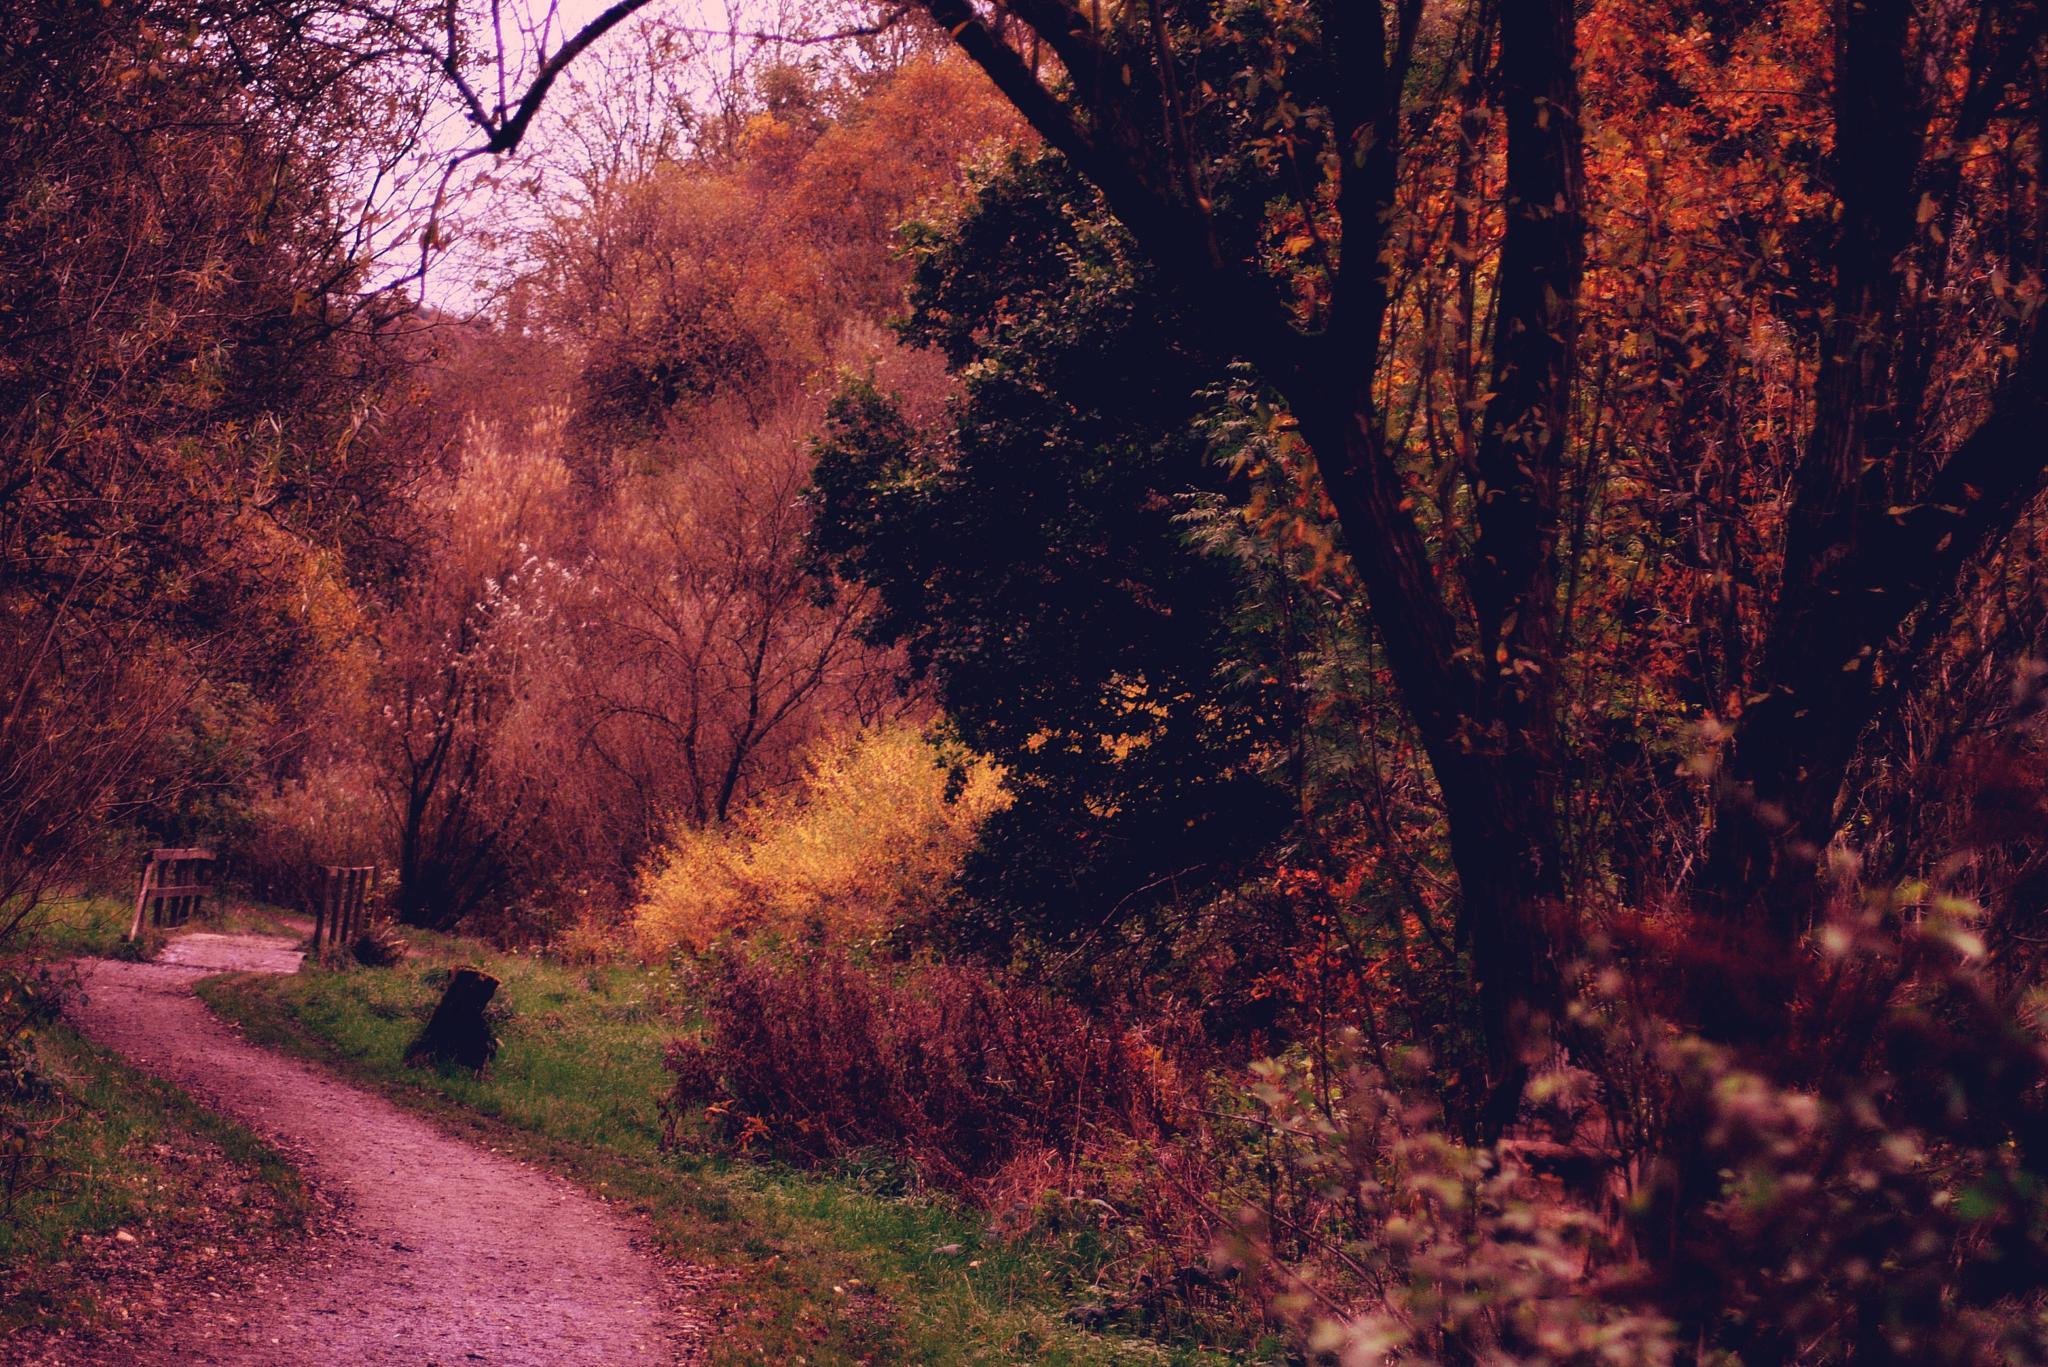 Autumn  invitation by gordon simpson